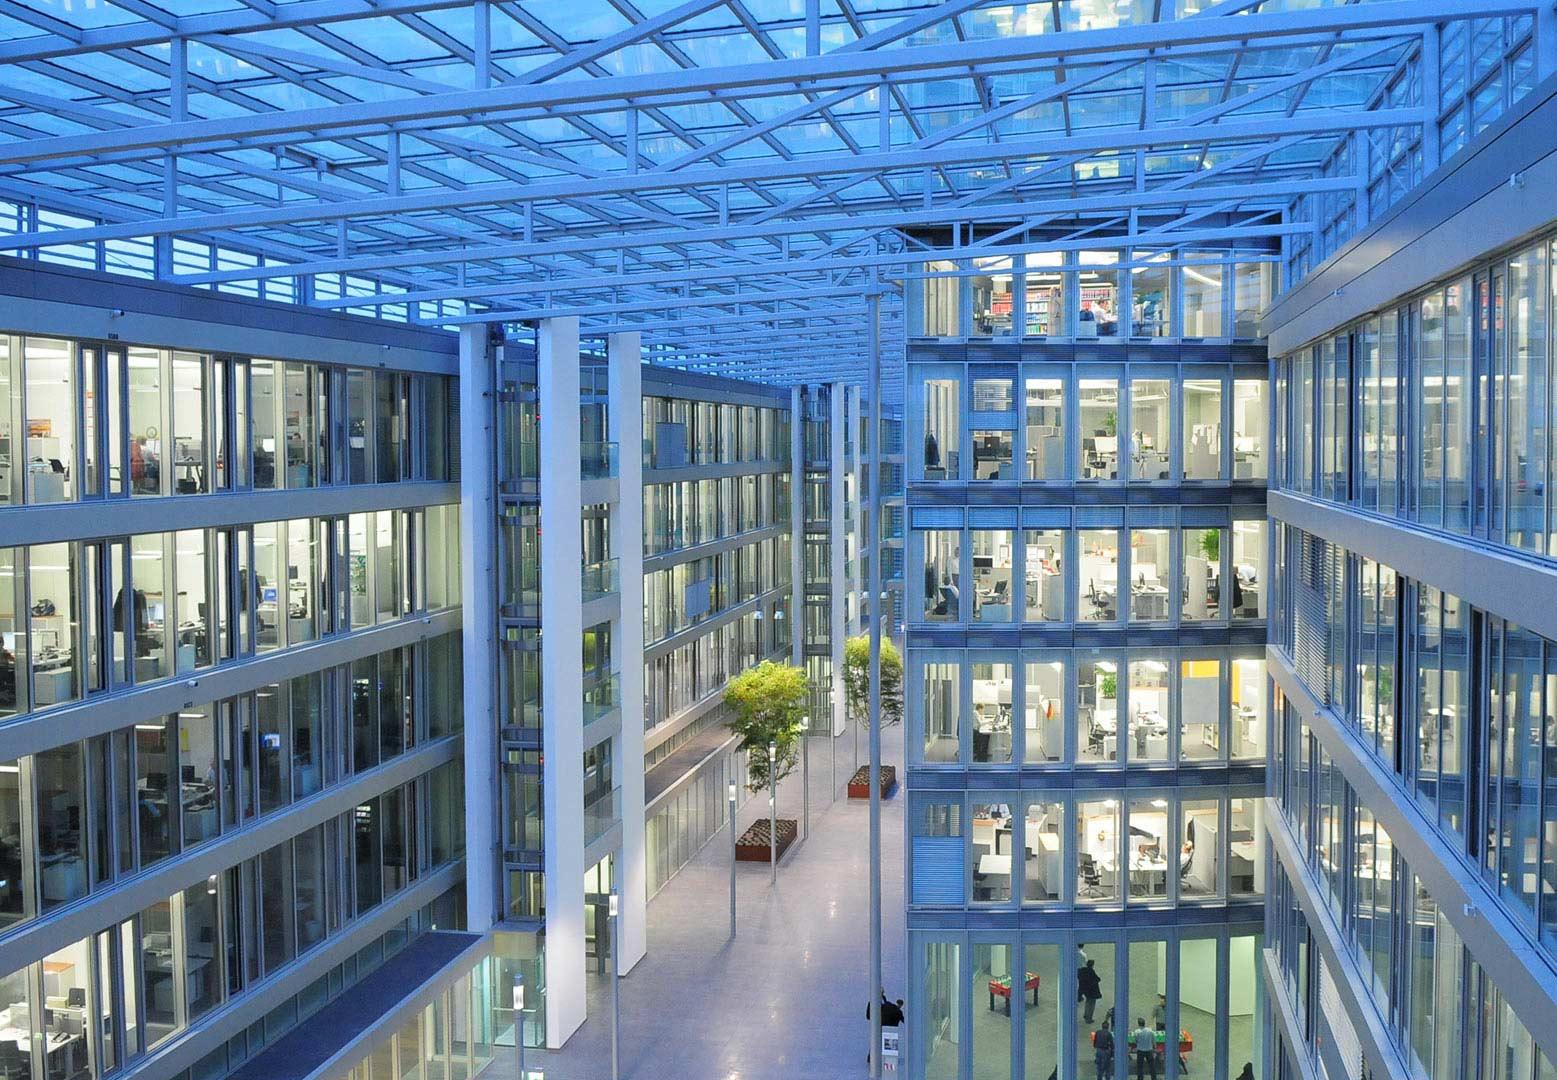 E.ON Ruhrgas_Kardorff Ingenieure Lichtplanung